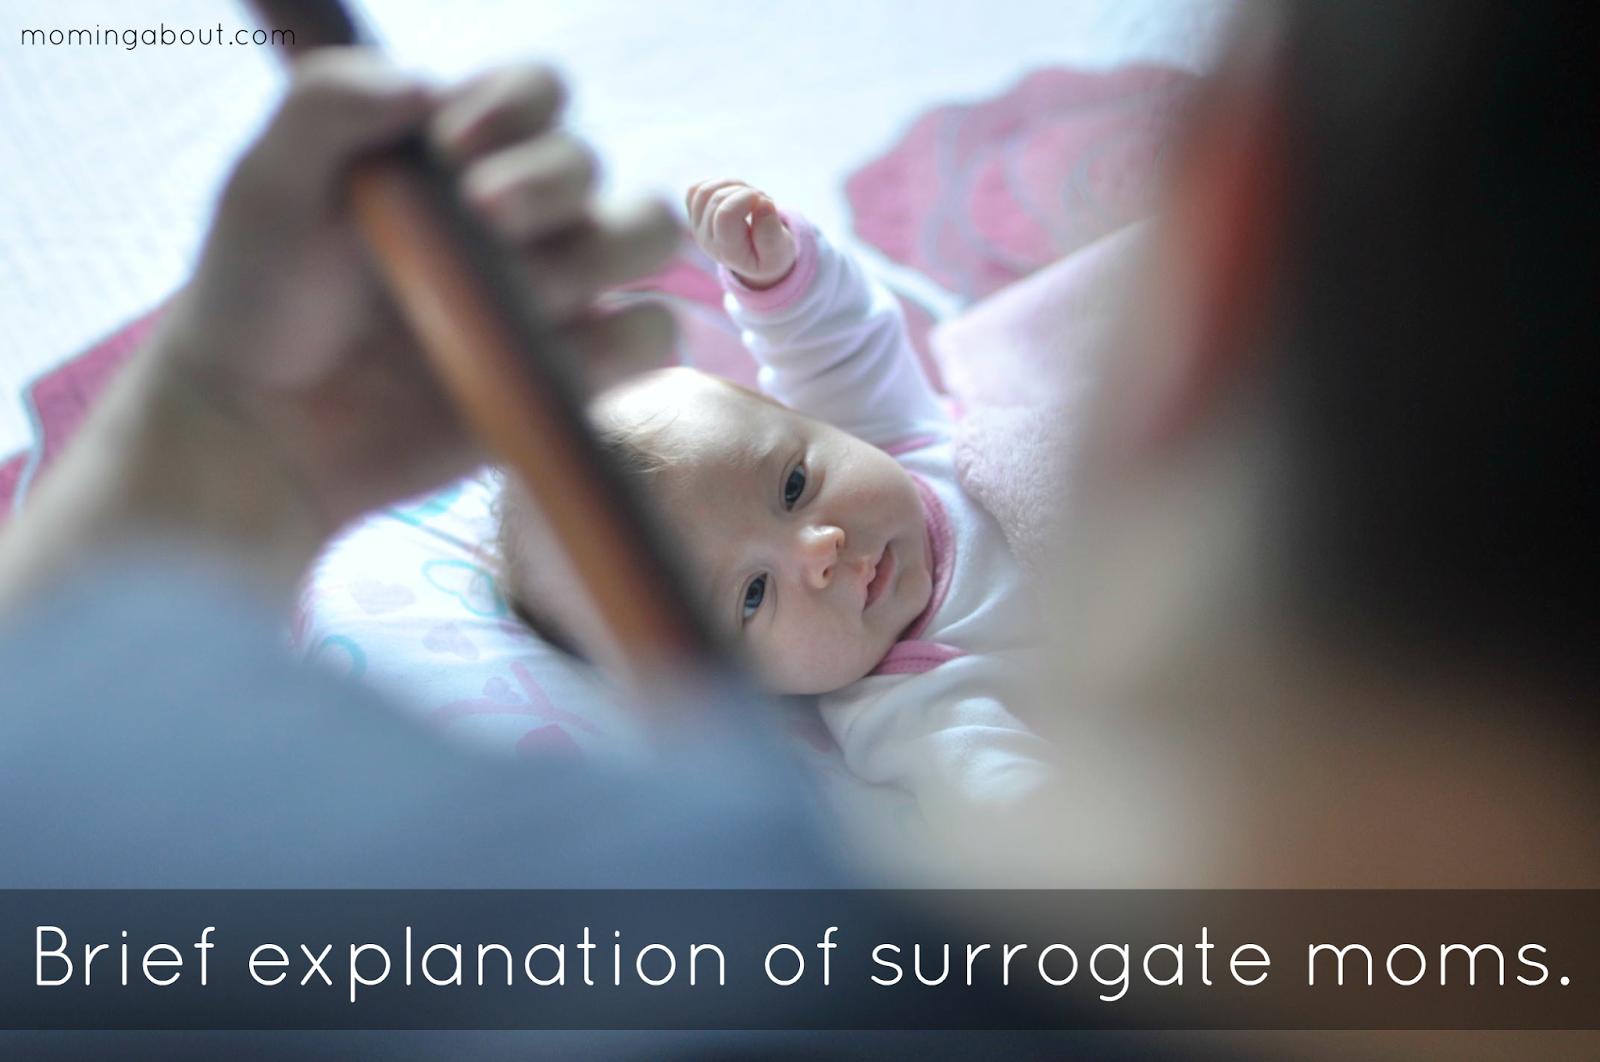 Brief explanation of surrogate moms